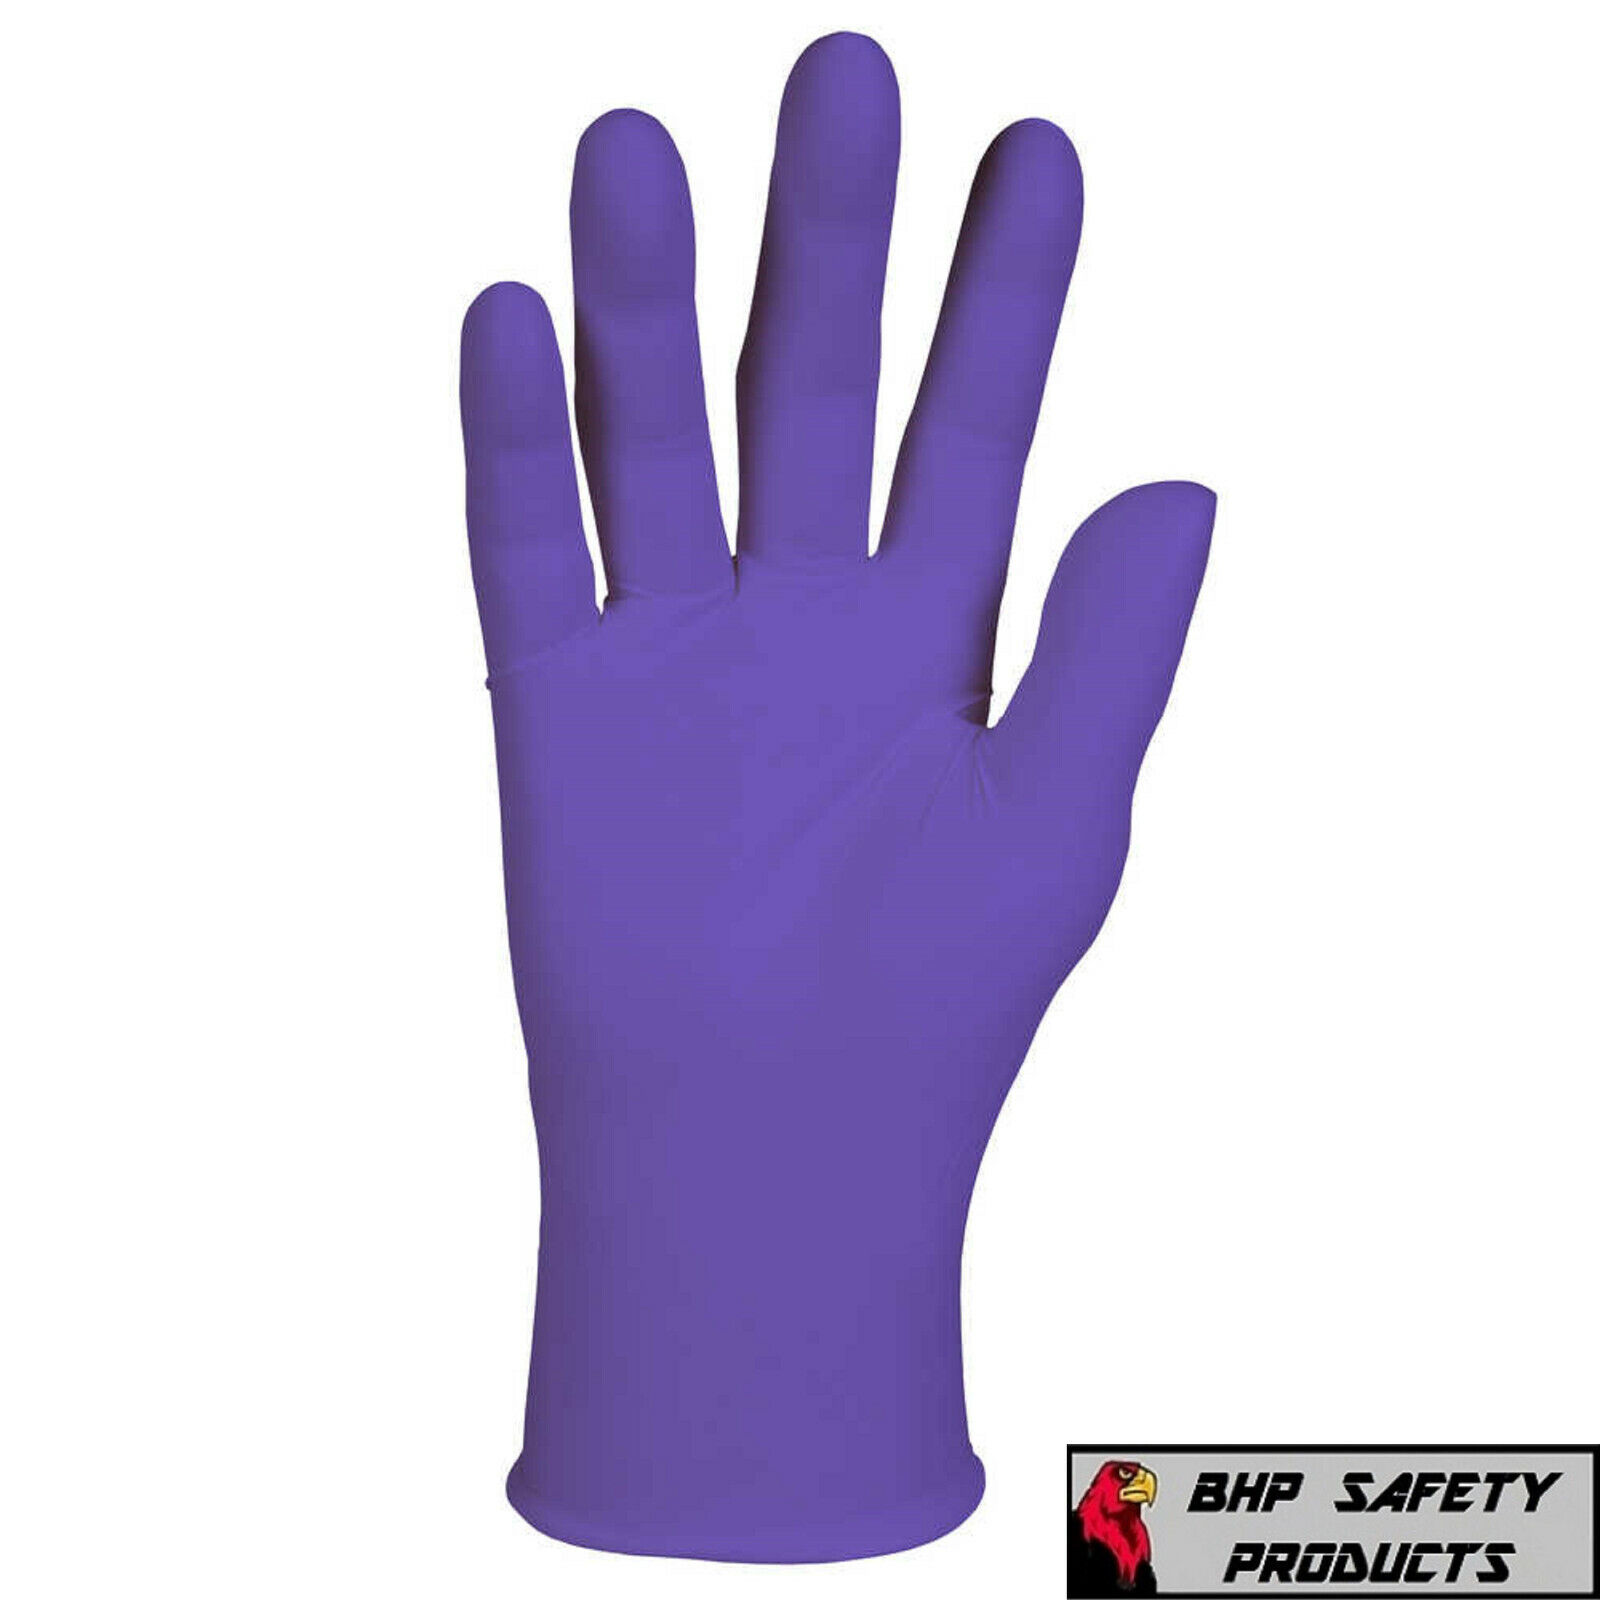 Haylard//Kimberly Clark Purple Nitrile Pack of 3 Size Xsmall 55080 300 gloves